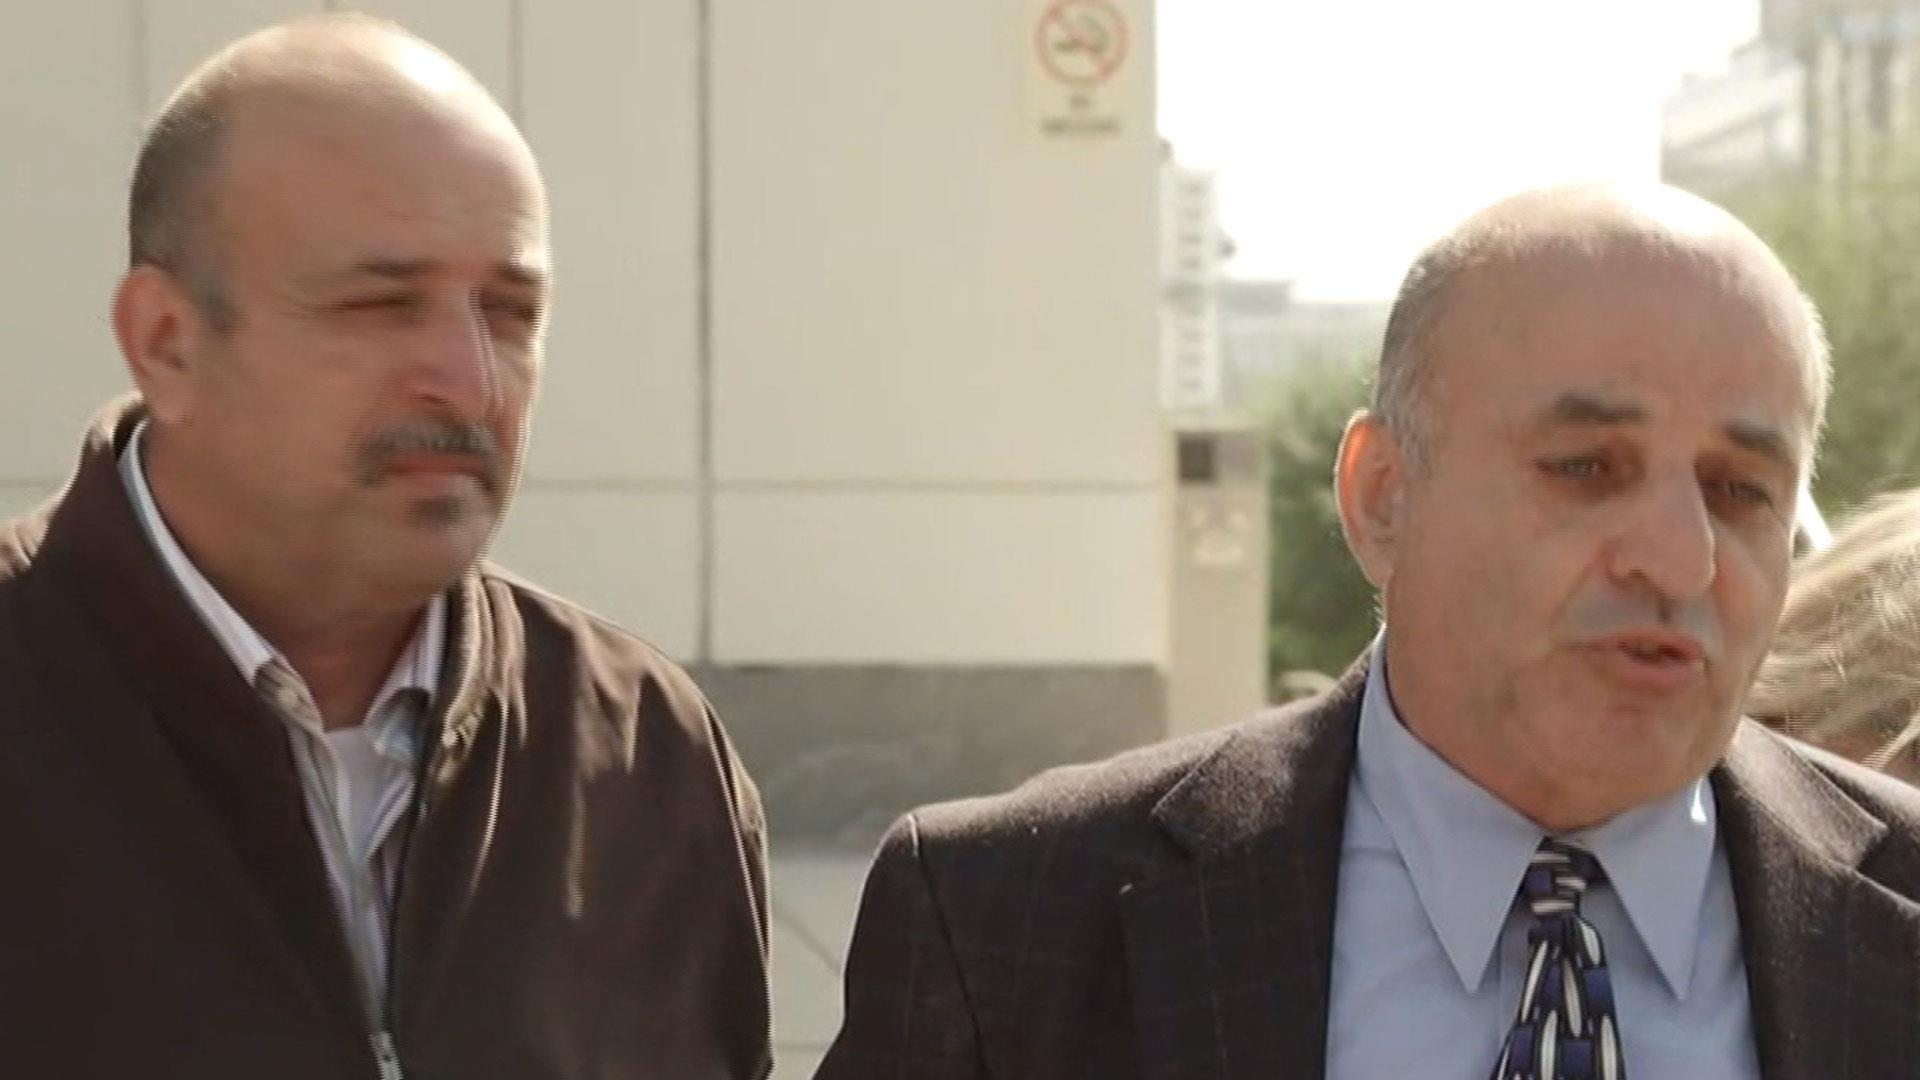 Family of Noor Salman reacts to not guilty Pulse shooting verdict